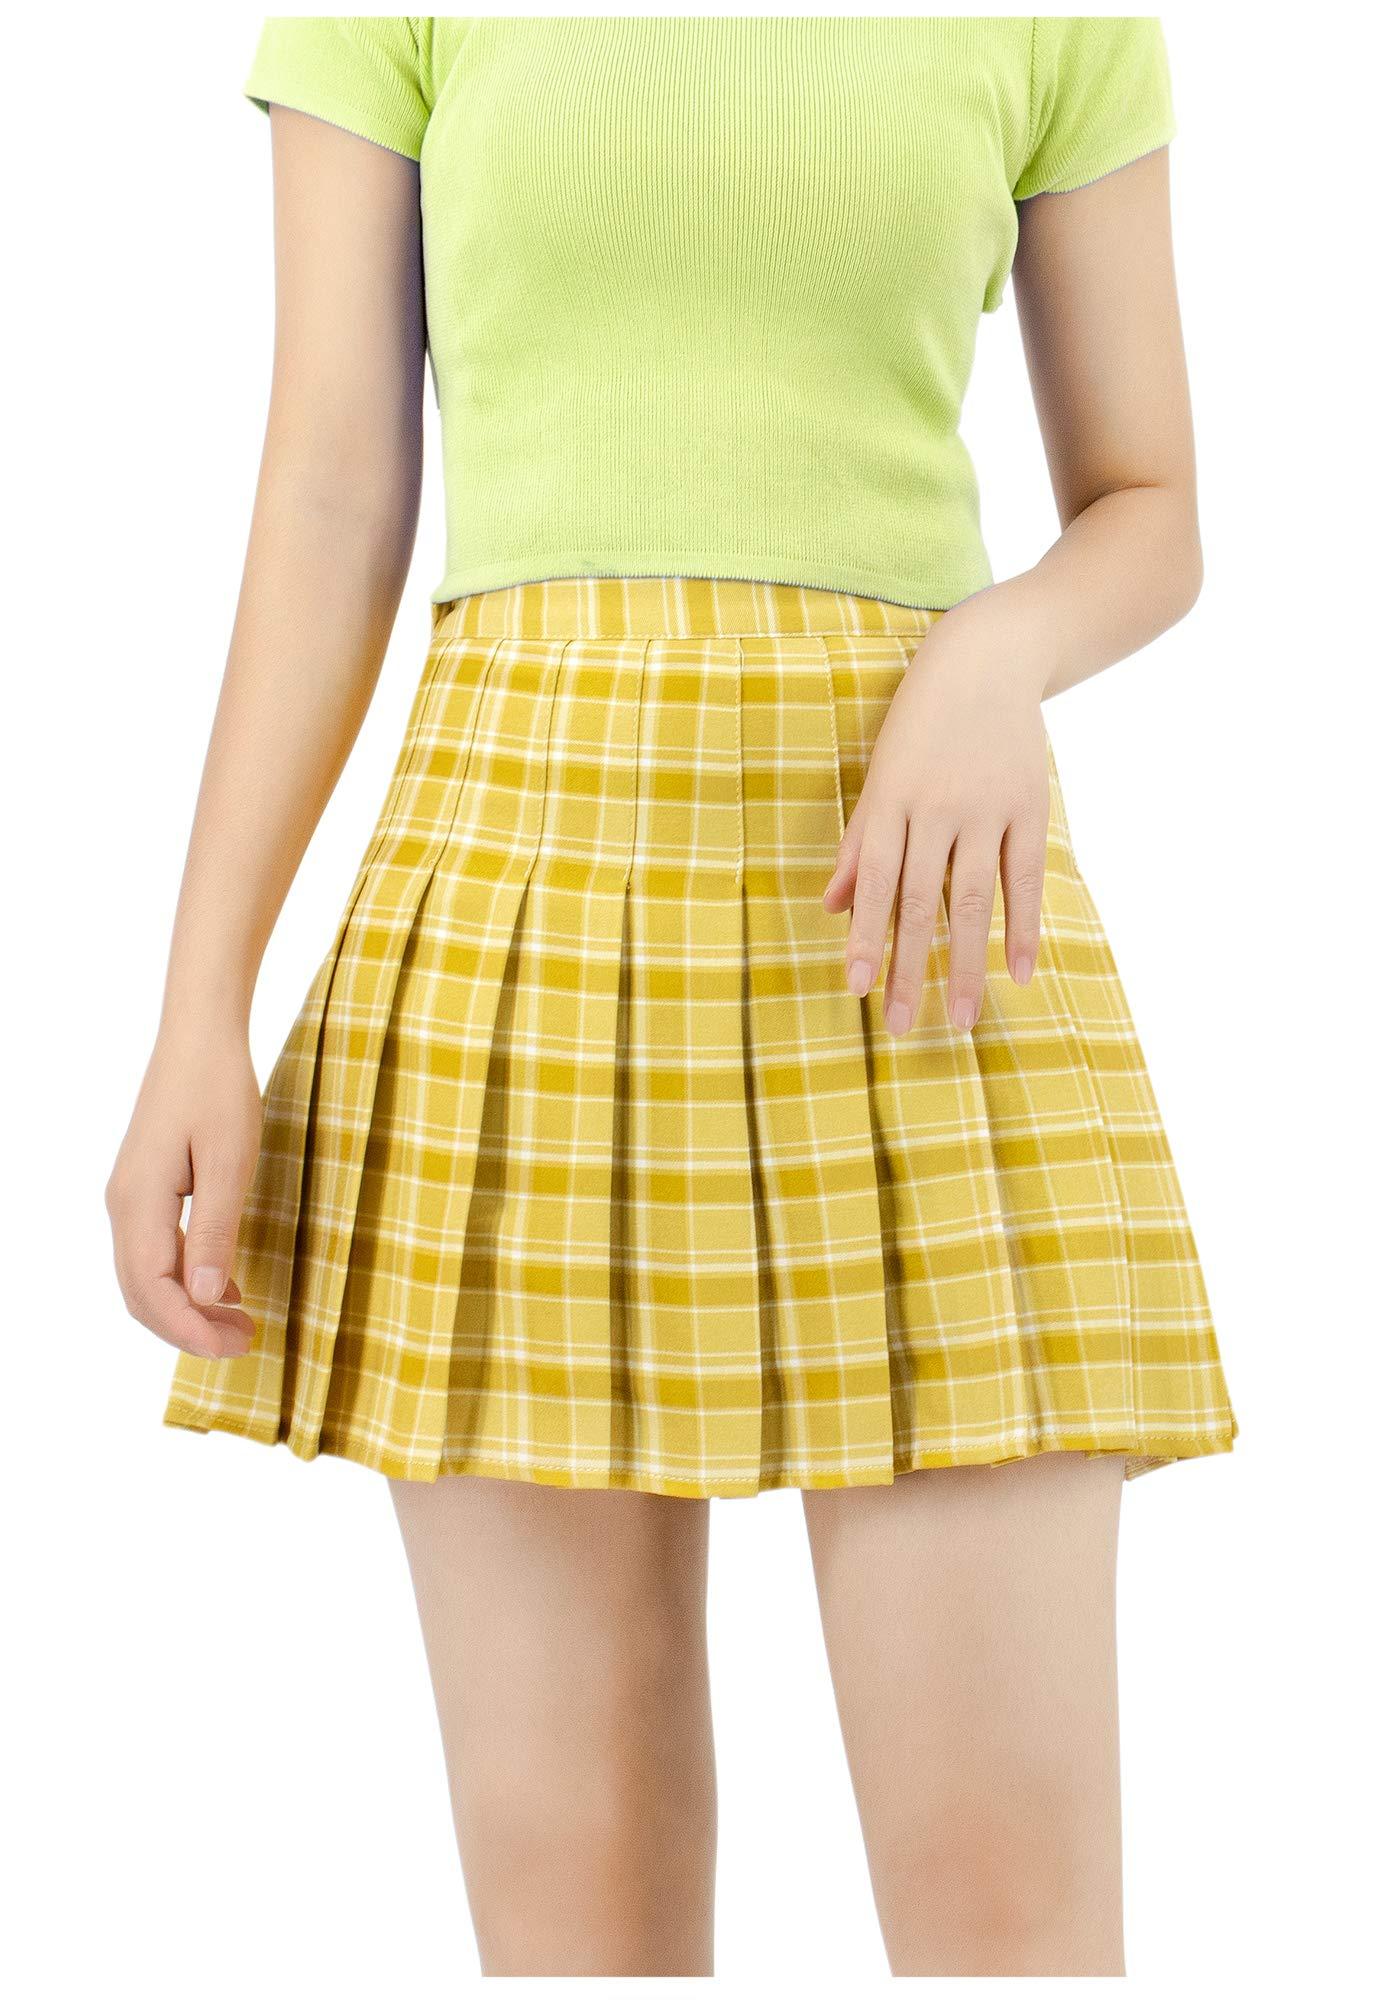 DAZCOS US Size Plaid Skirt High Waist Japan School Uniform Skirts for Women